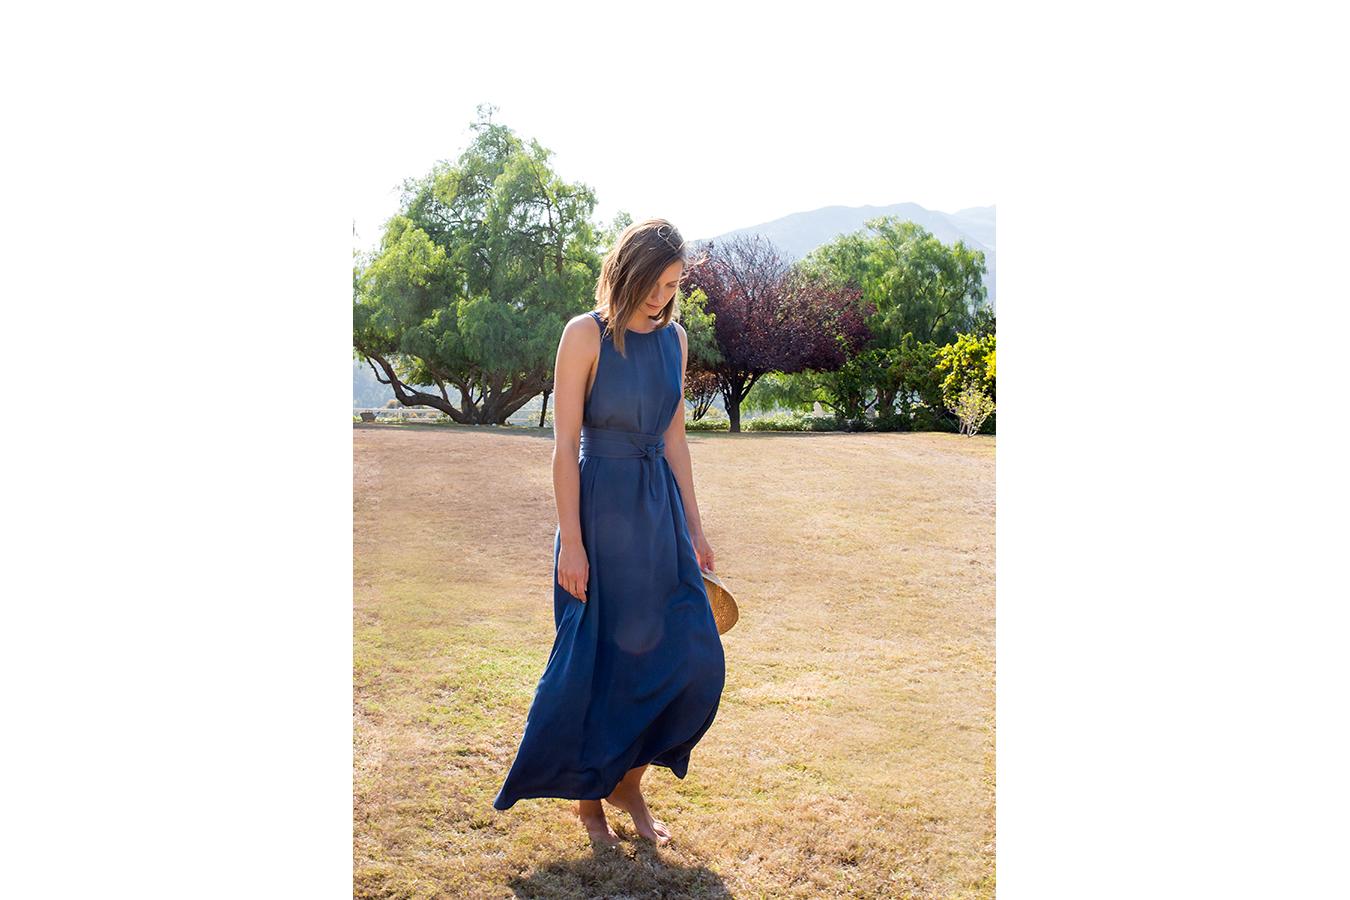 Jesse-Kamm-Palma-Dress